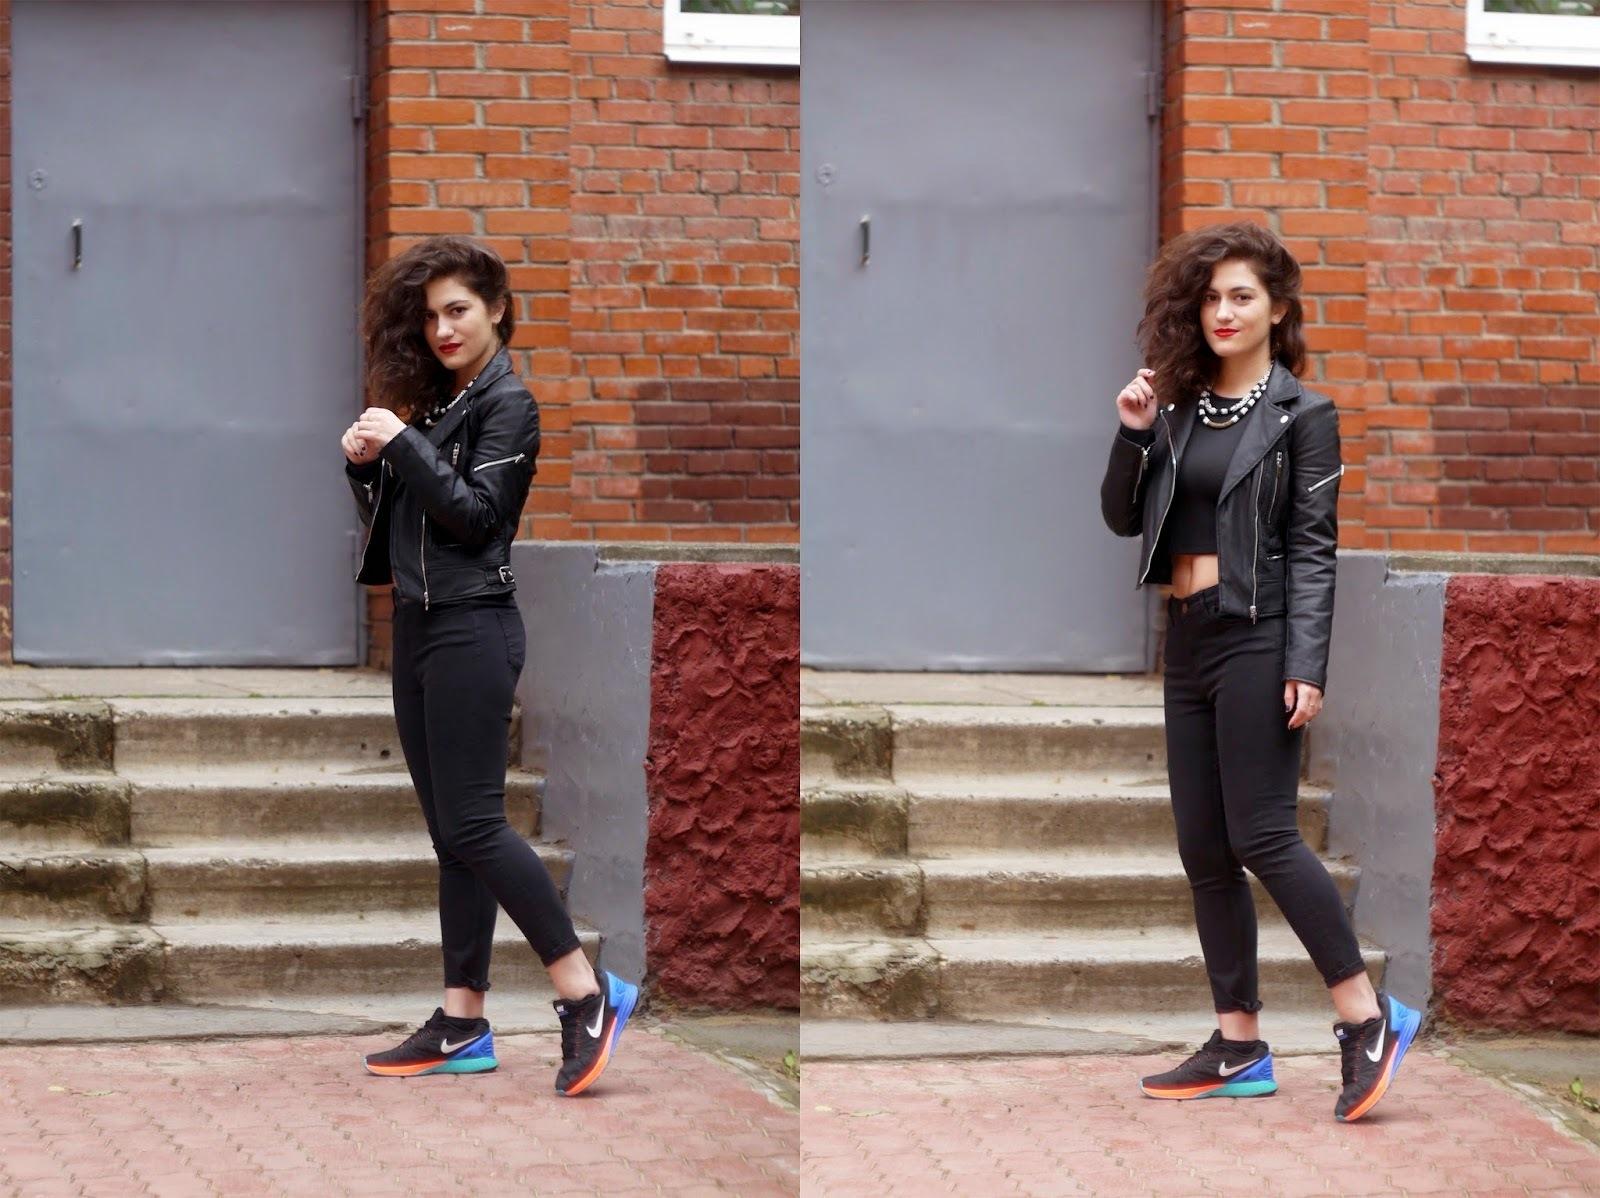 Women's Black Leather Biker Jacket, Black Cropped Top, Black ...